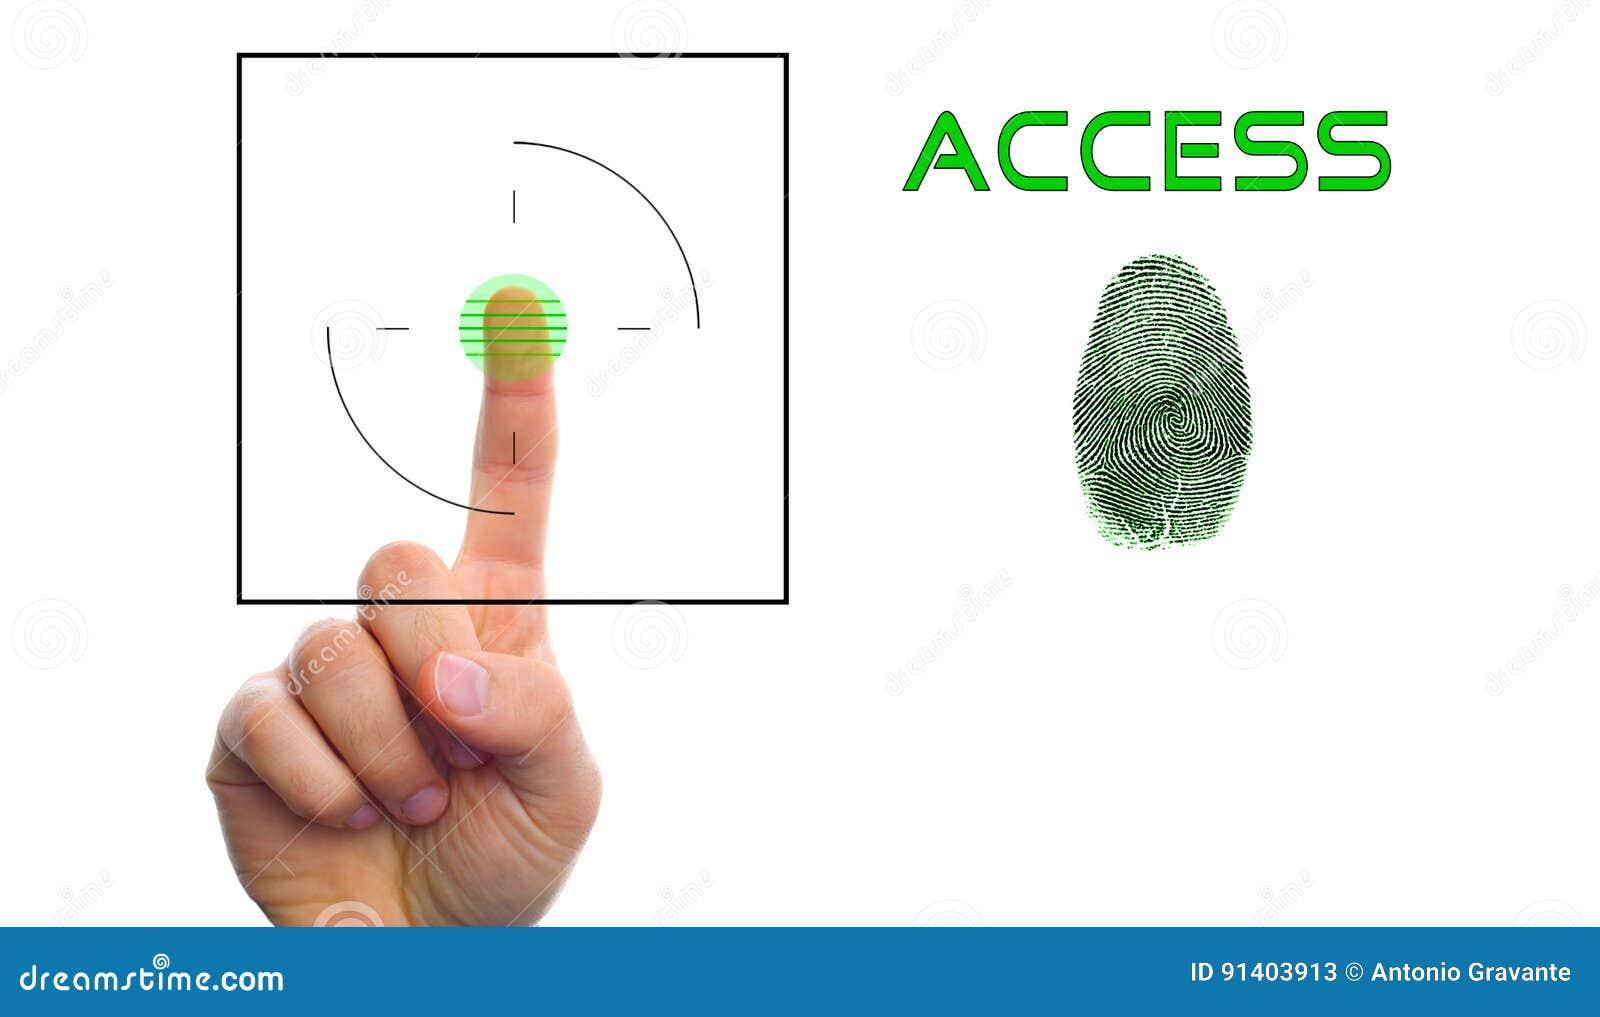 Fingerprint Scan Provides Security Access Stock Image